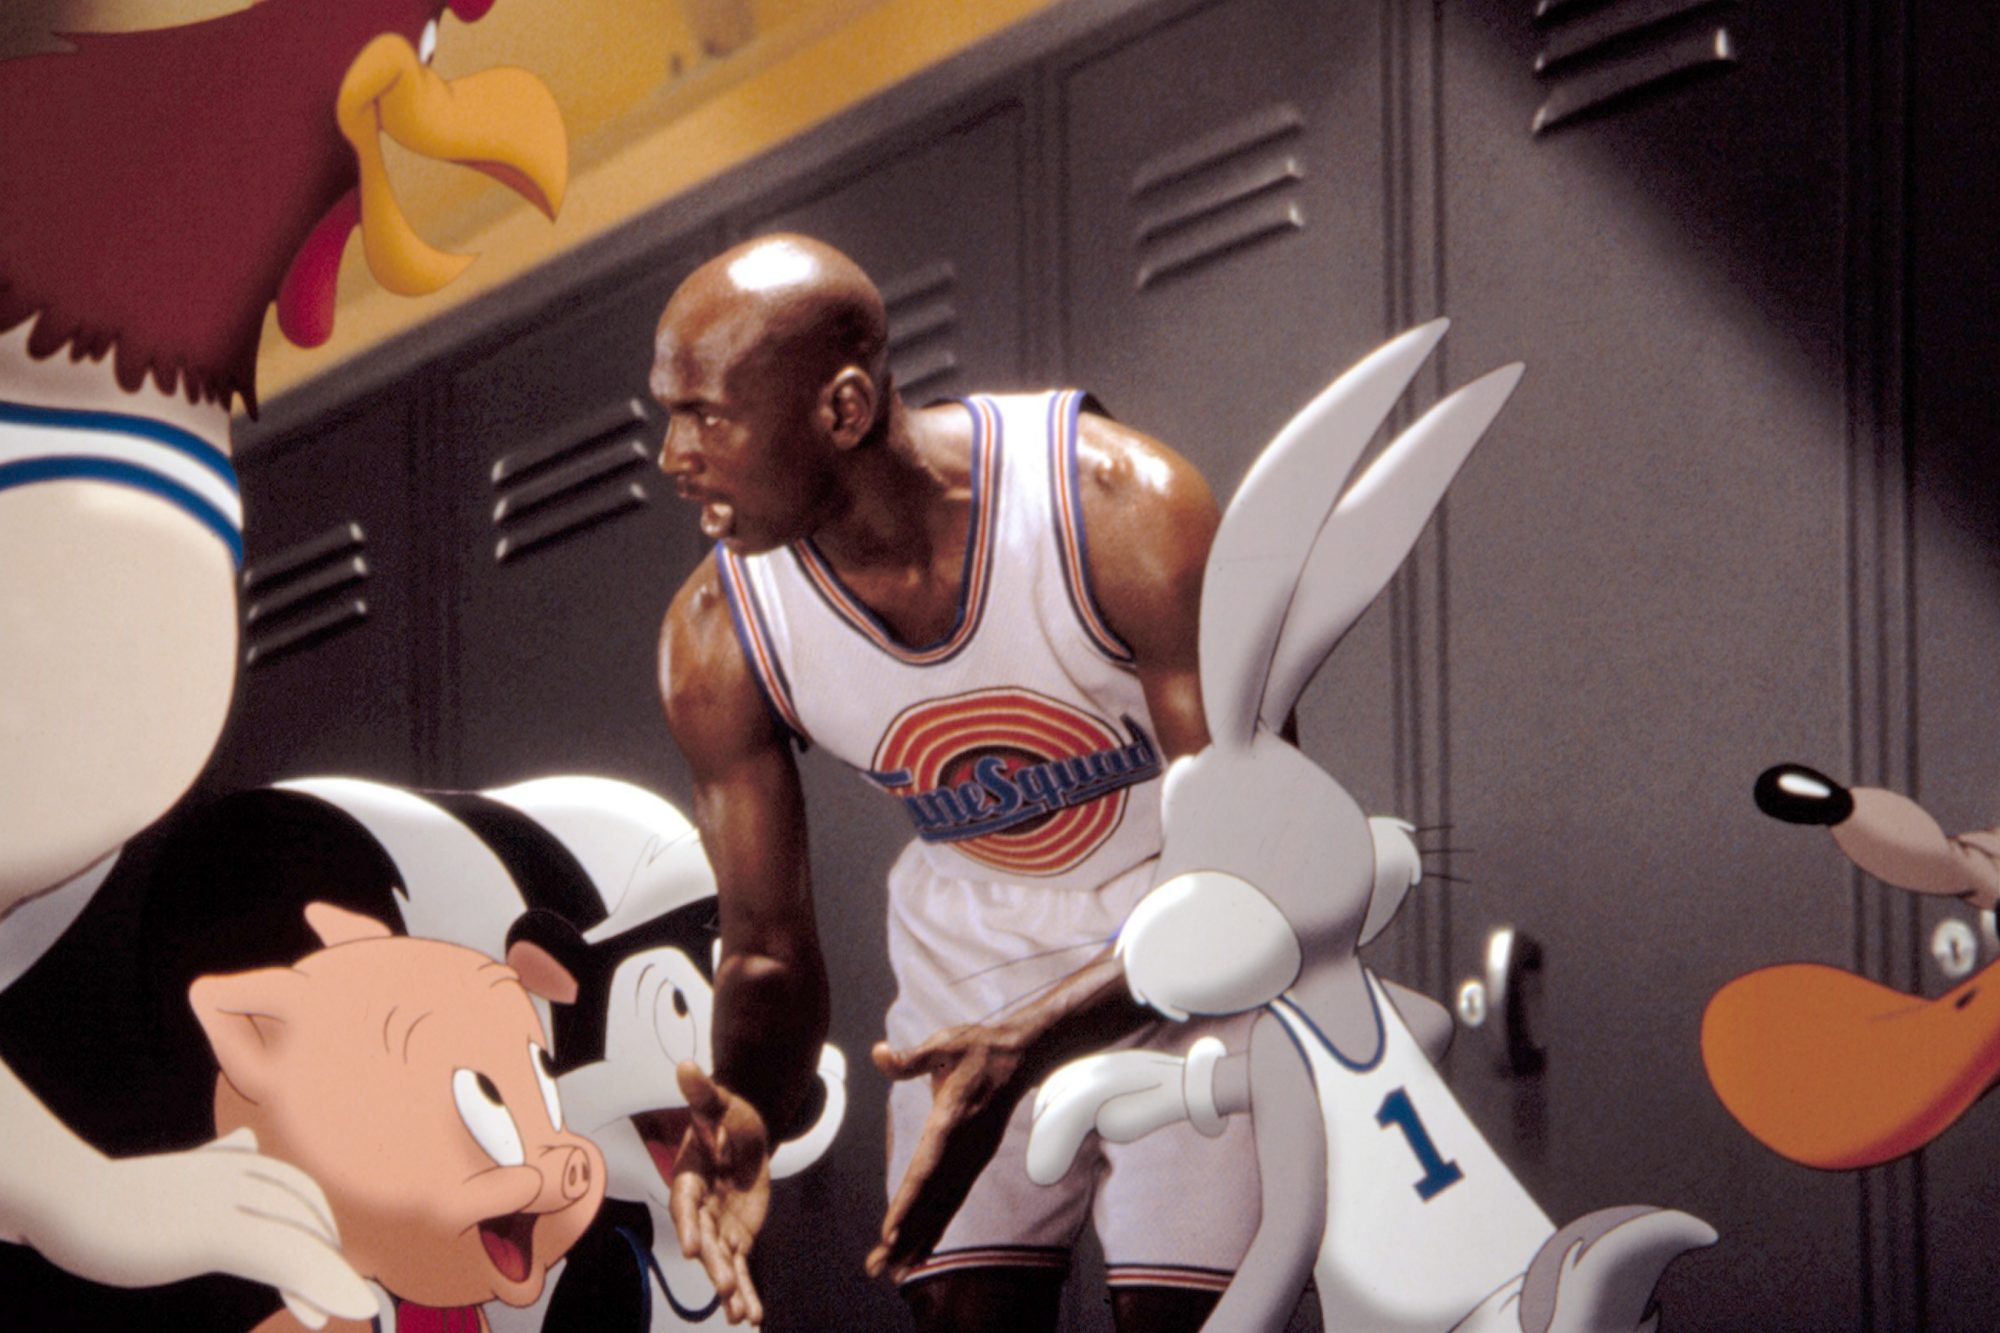 SPACE JAM, Foghorn Leghorn, Porky Pig, Pepe le Pew, Michael Jordan, Bugs Bunny, Daffy Duck, 1996. (c